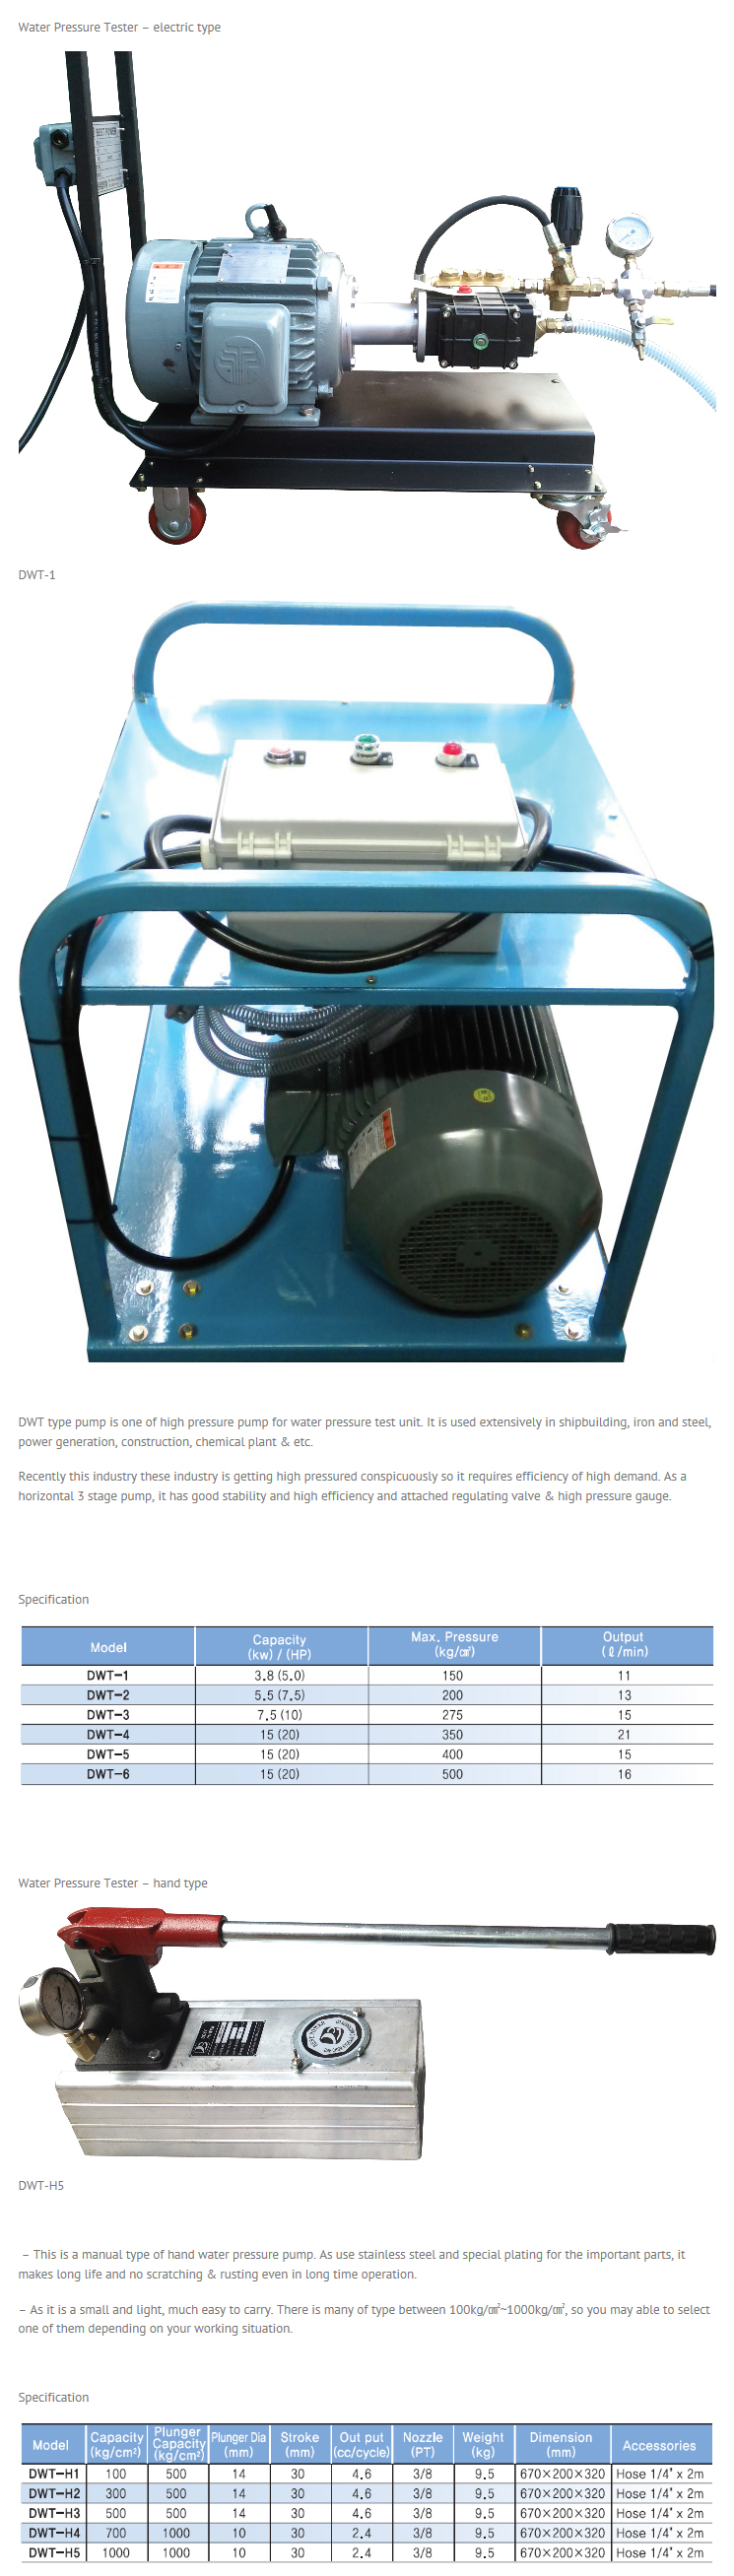 Daechun Hydraulic Machinery Water Pressure Tester DWT-Series